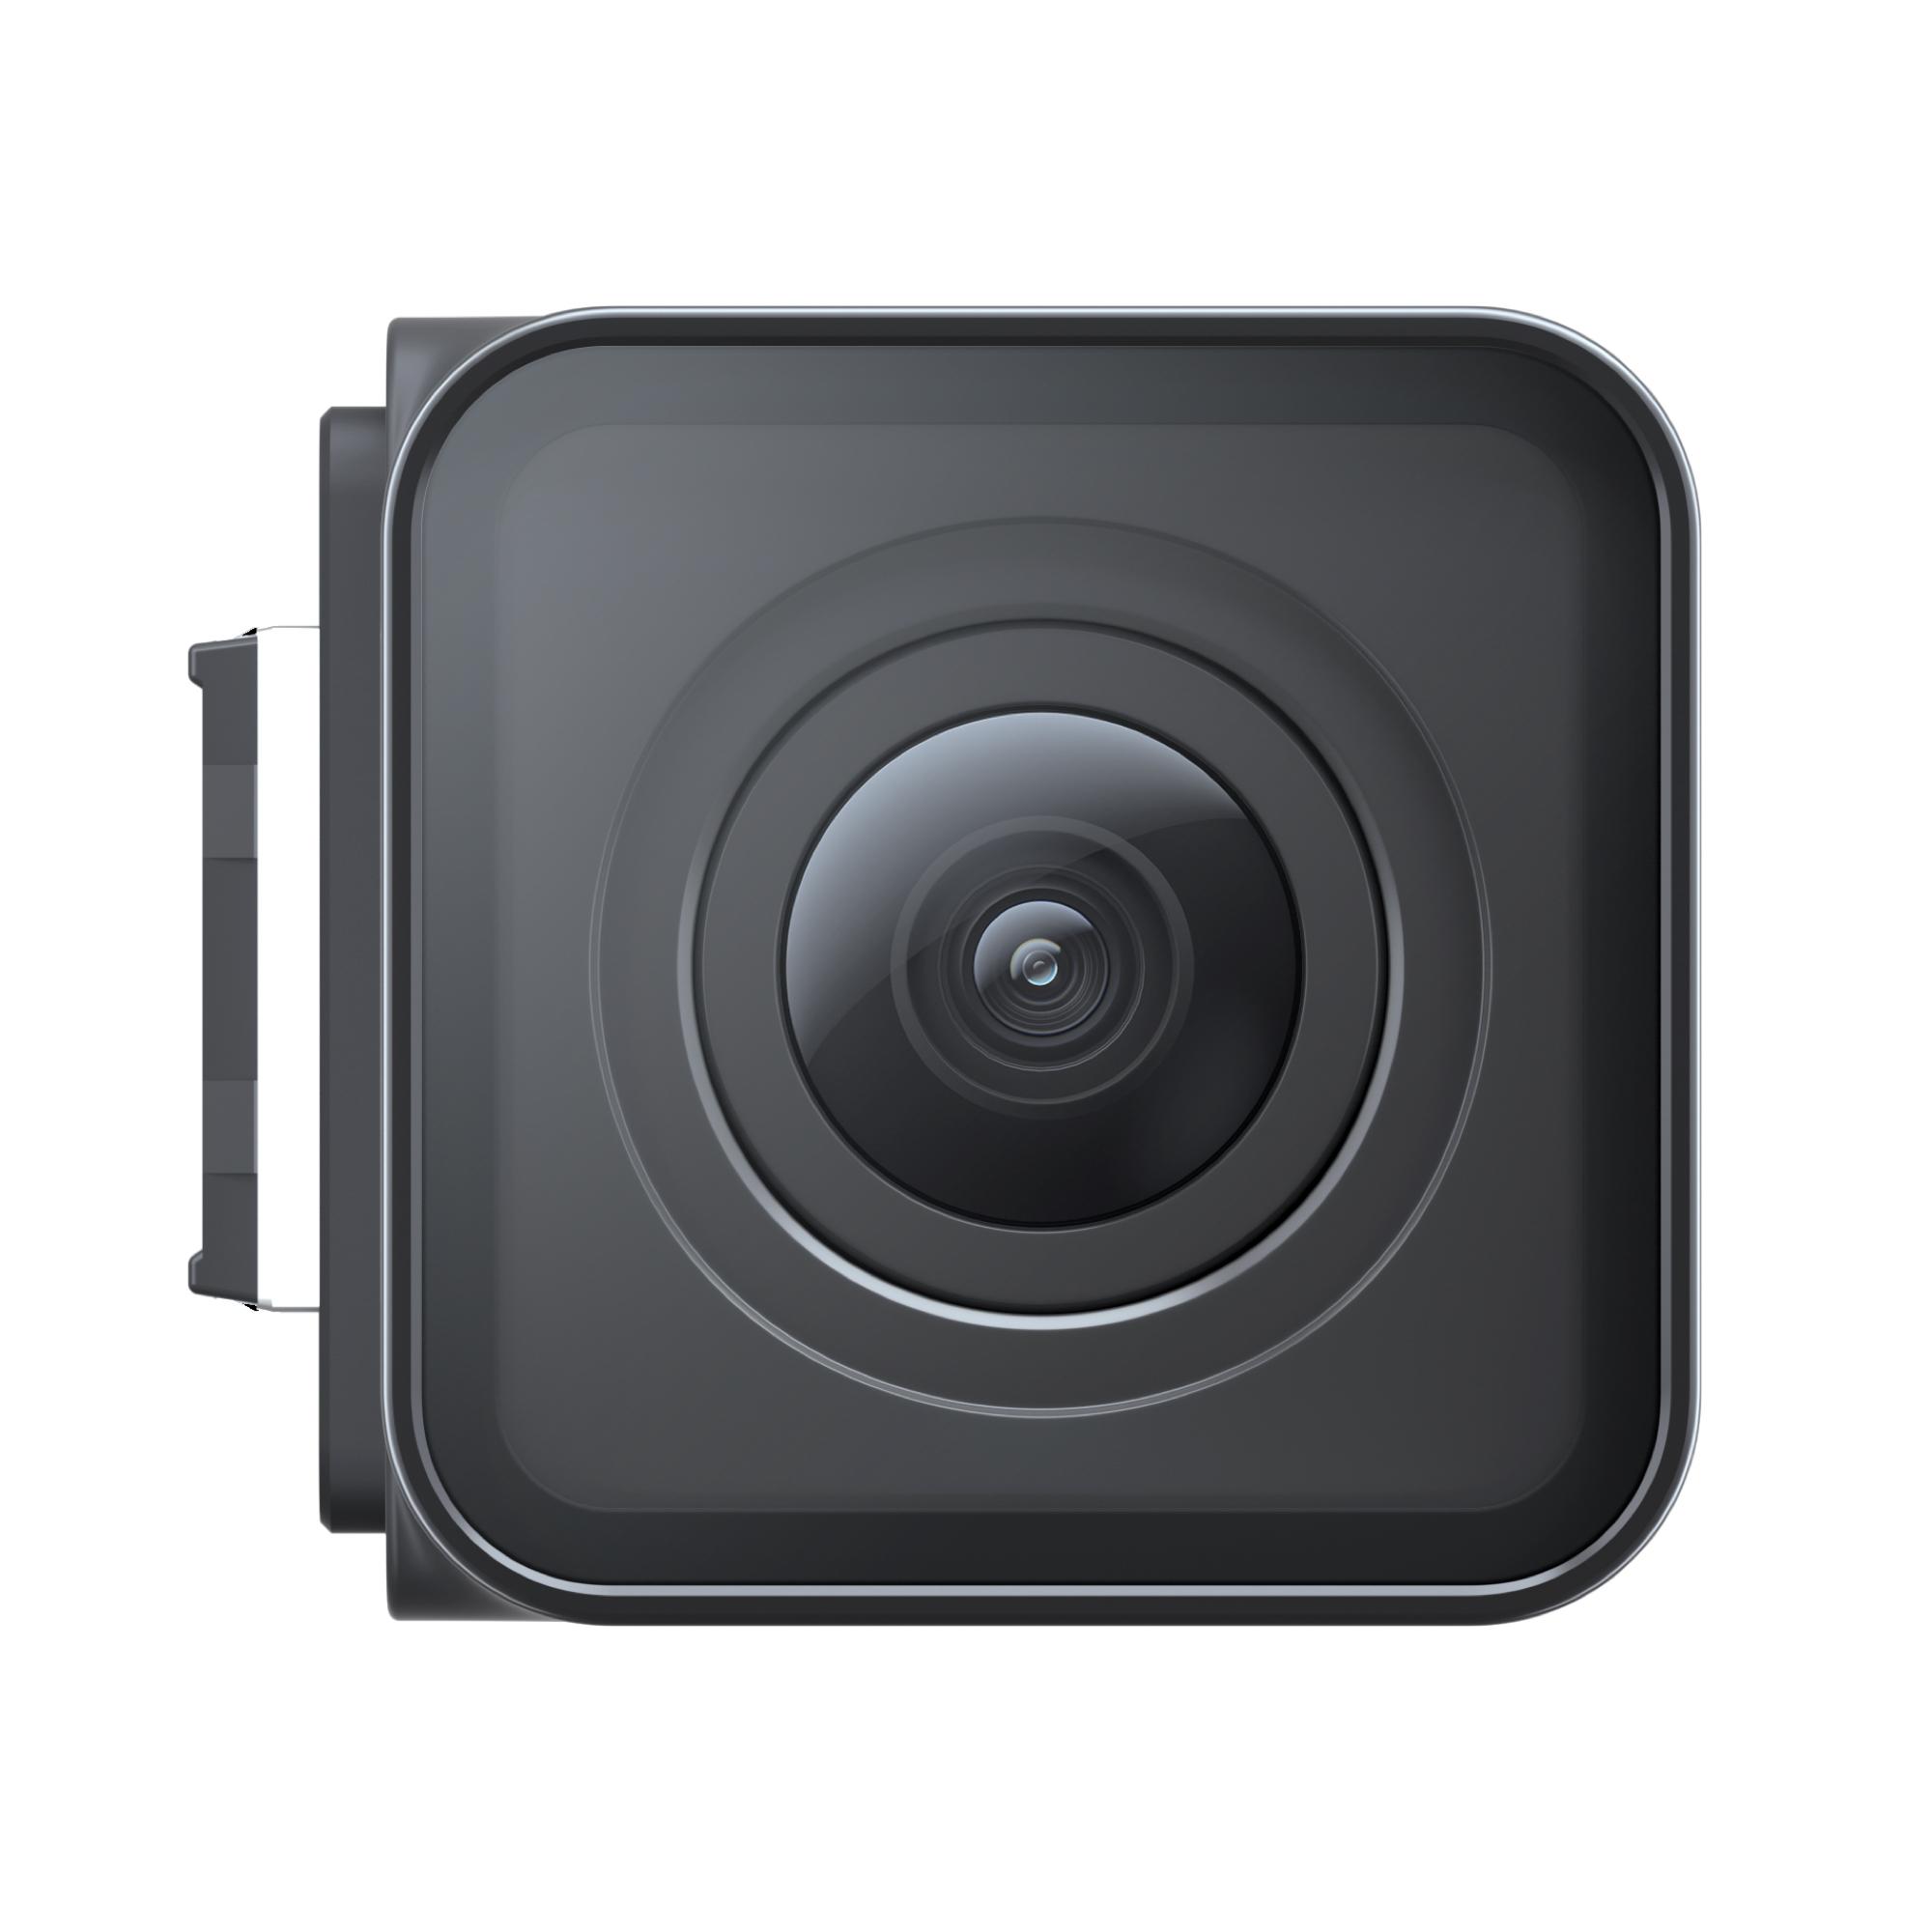 Caméra ONE R 4K - Insta360